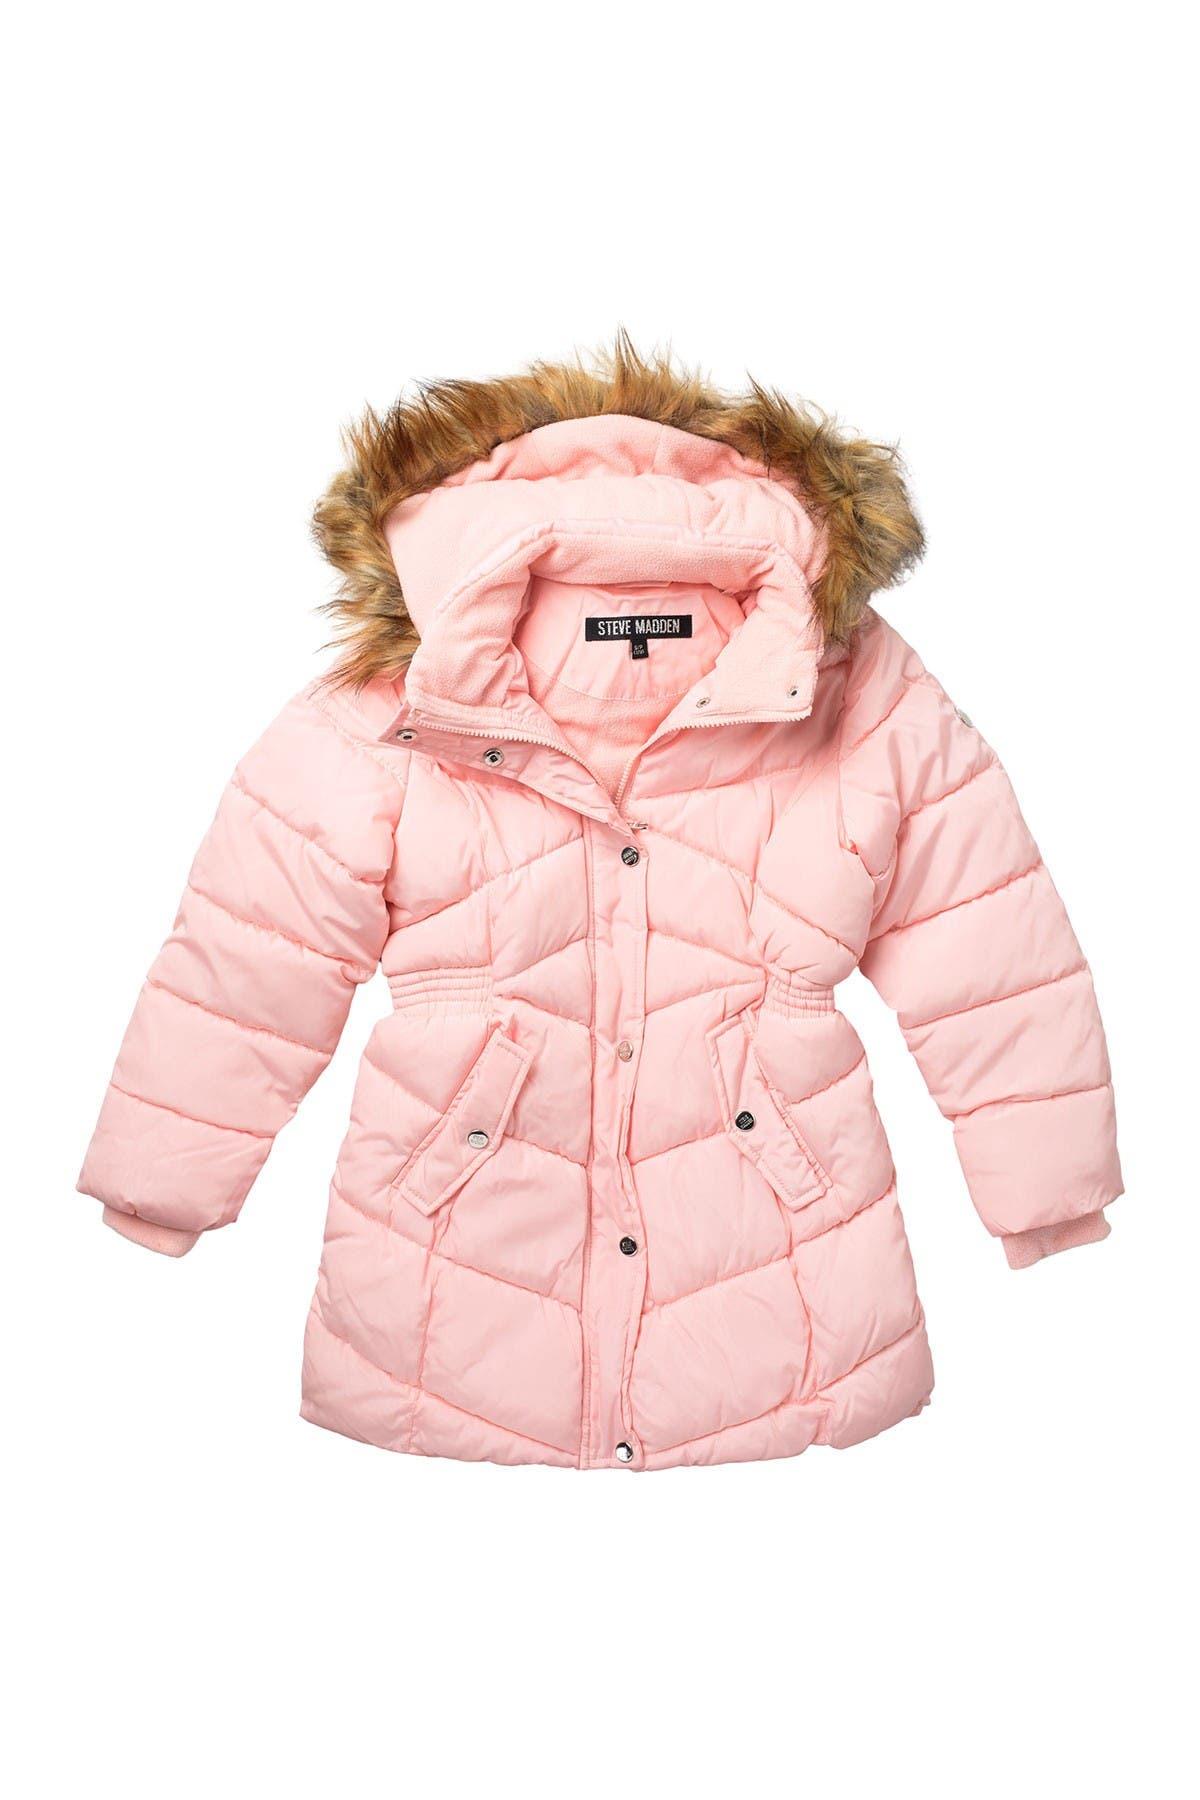 Coats \u0026 Jackets   Nordstrom Rack